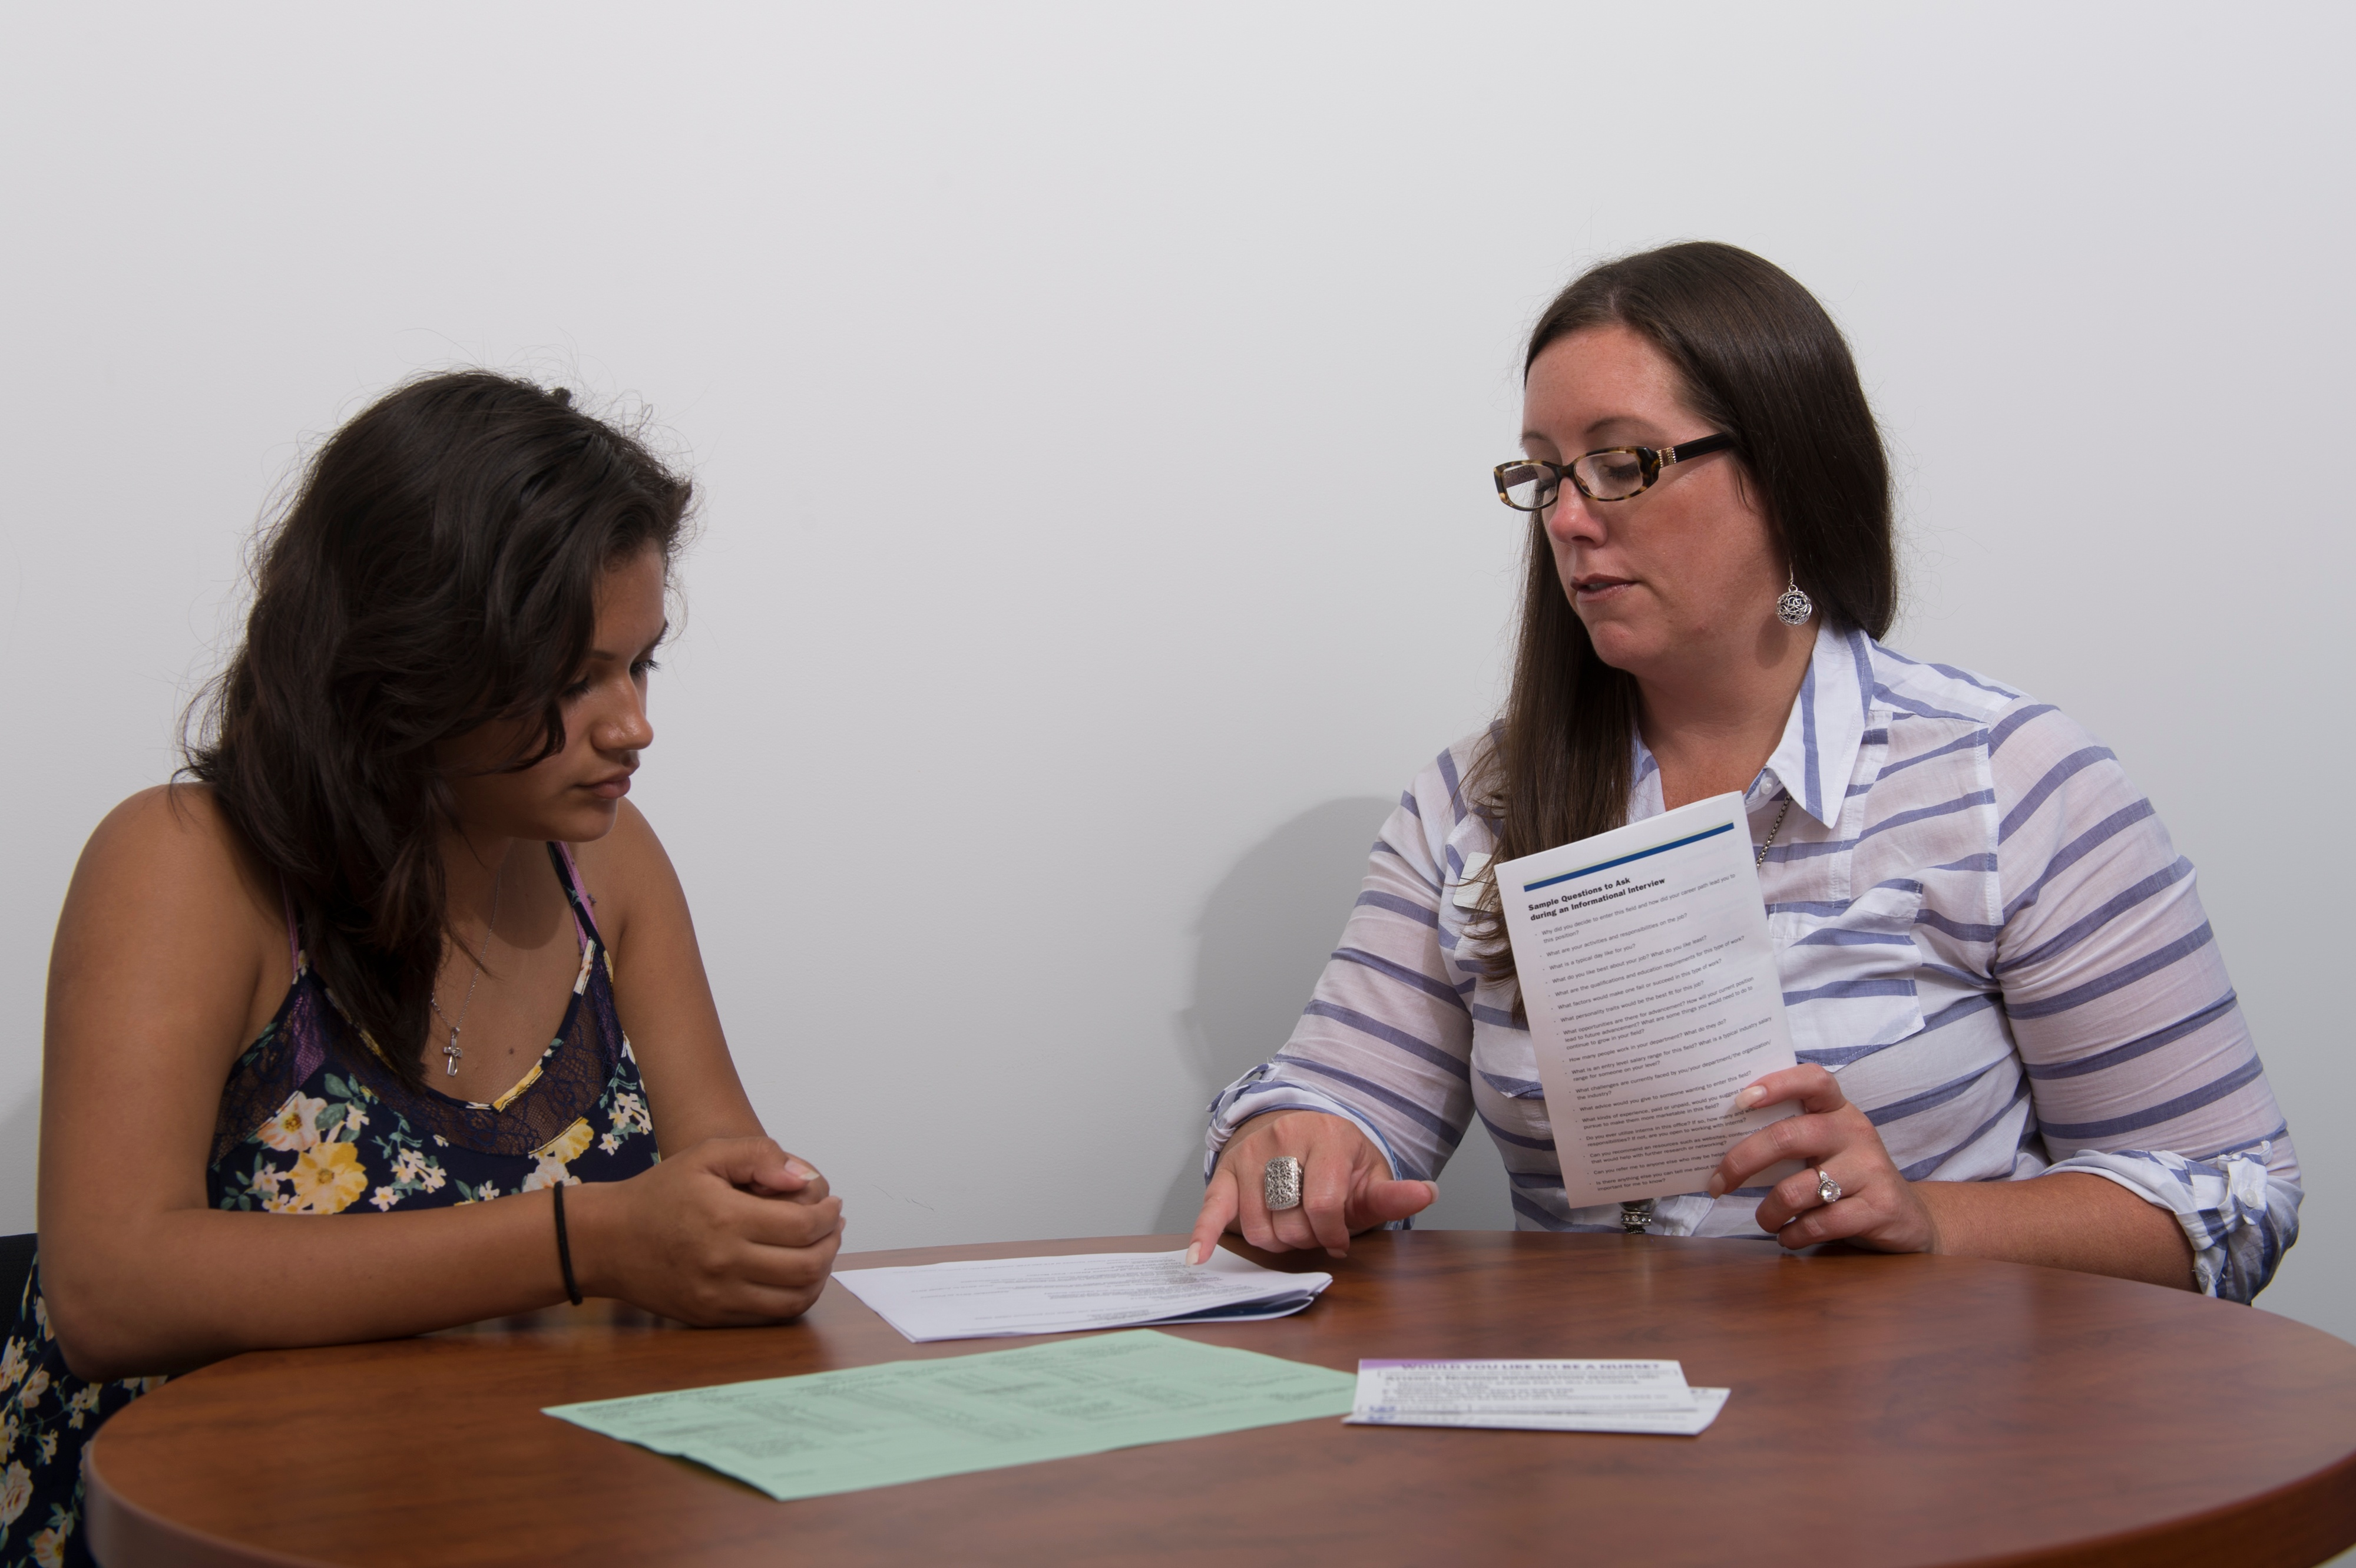 career services meeting 10 best kept secrets for new students jjc joliet junior college